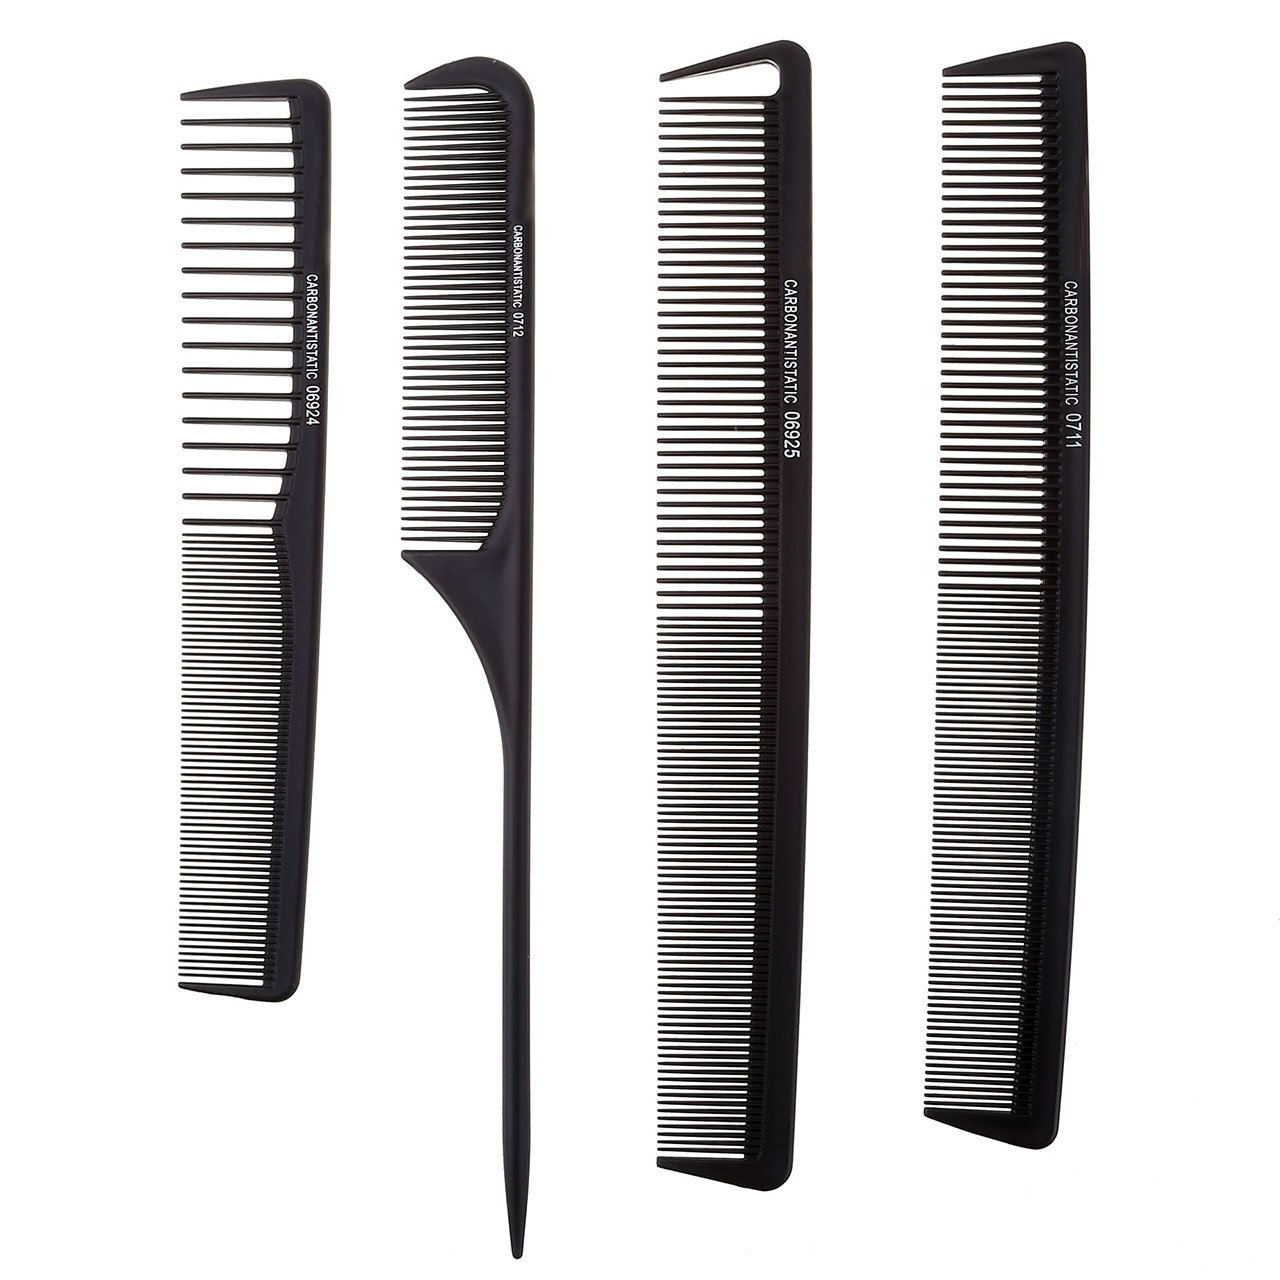 Faleto Black Pro Salon Hair Comb Set Plastic Barbers Cutting Combs Set